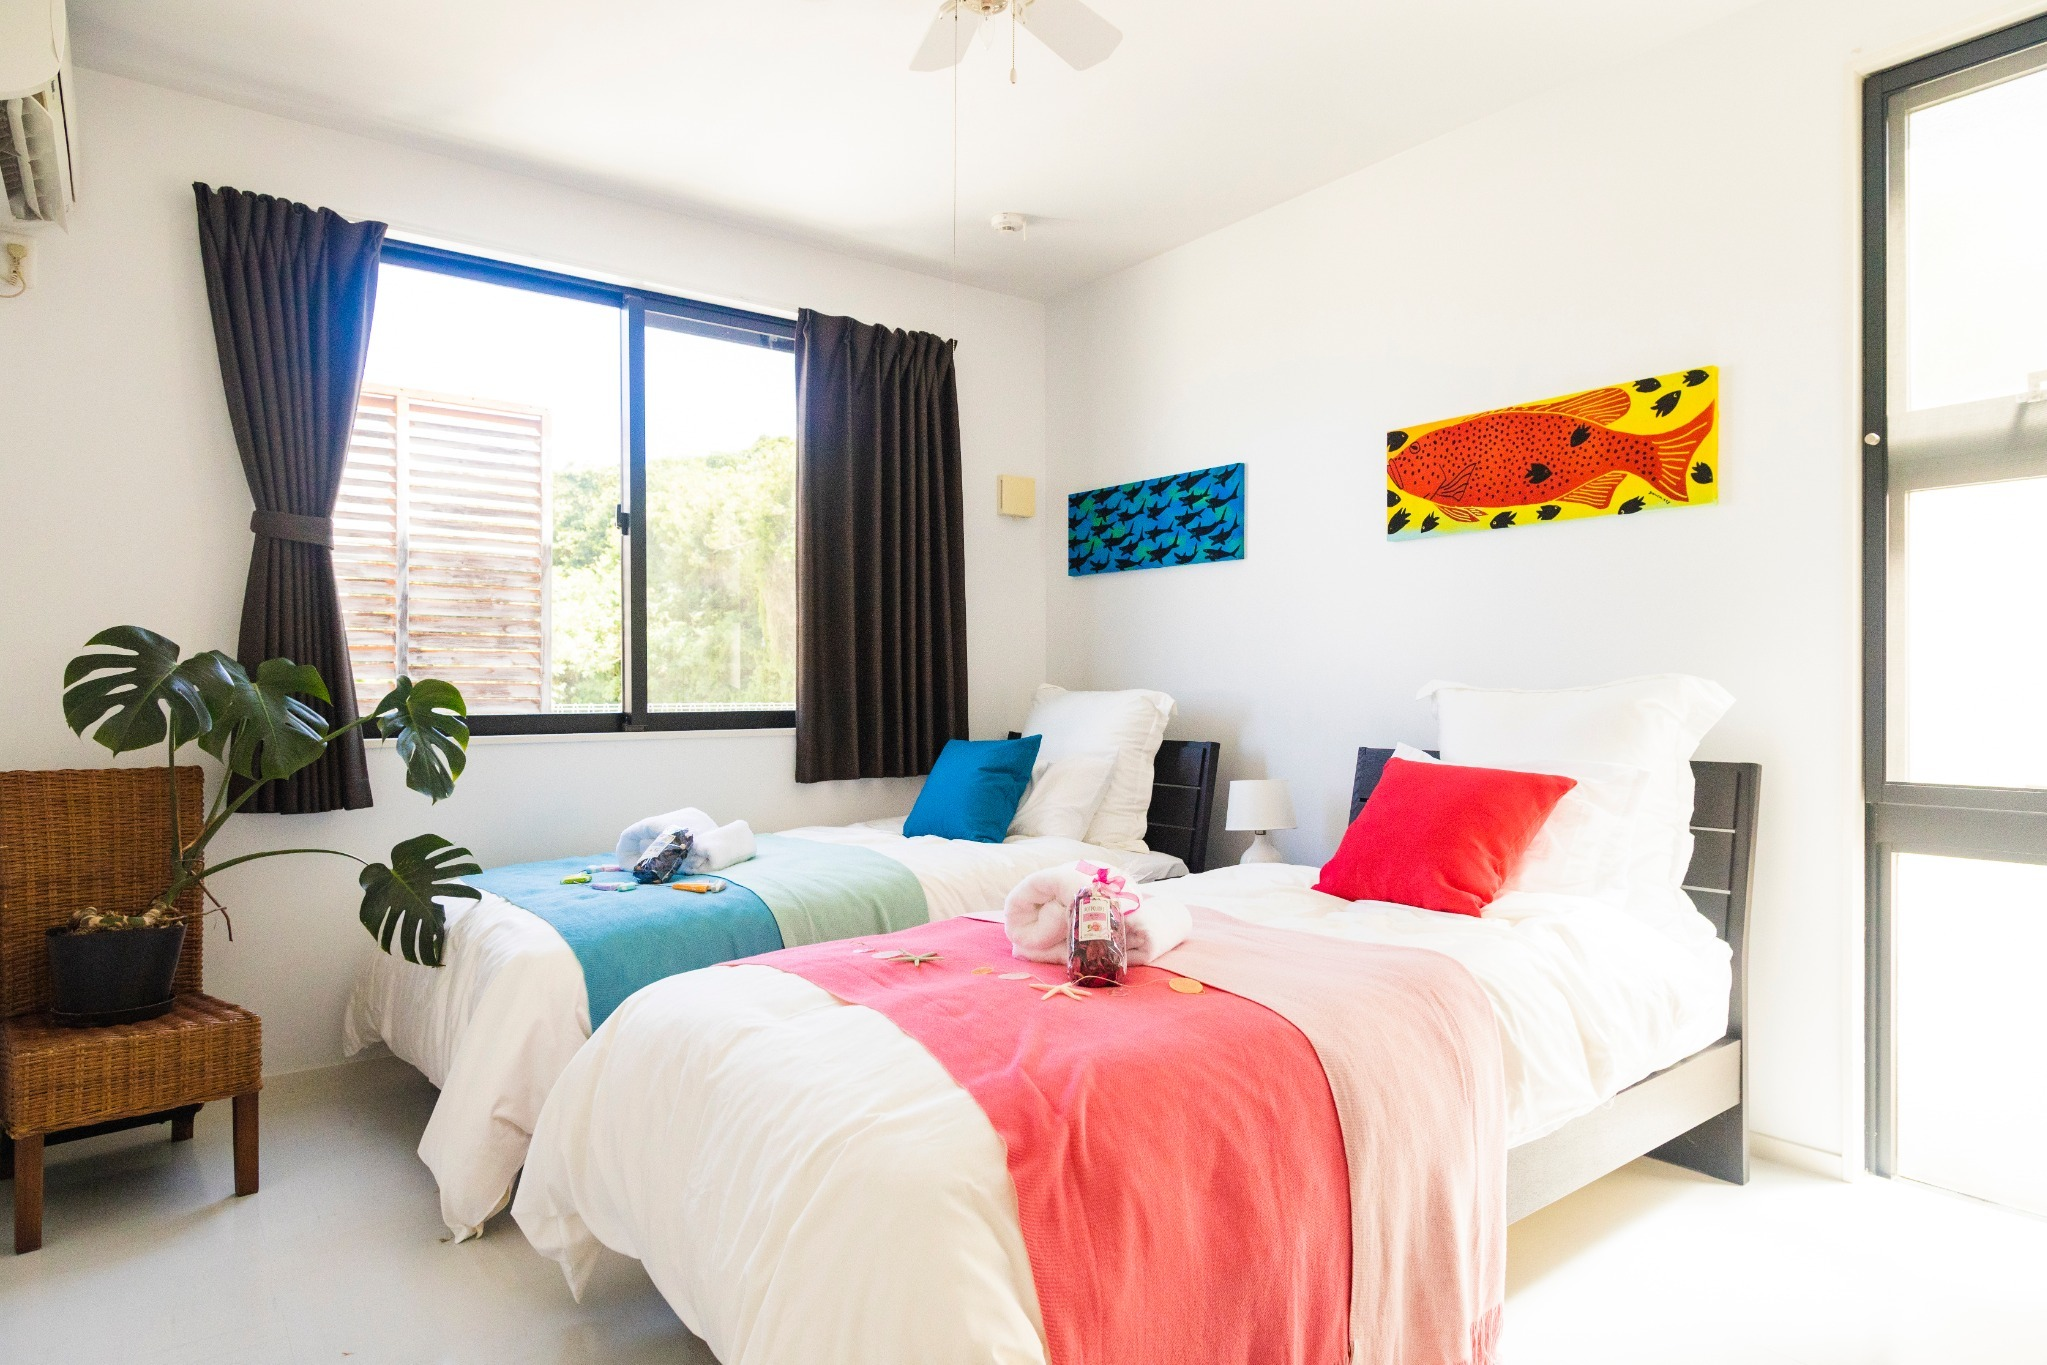 Blue & pink bed room: single-size bed×2, folding single-size bed×1 ブルー&ピンクベッドルーム:シングルベッド×2、折り畳みシングルベッド×1